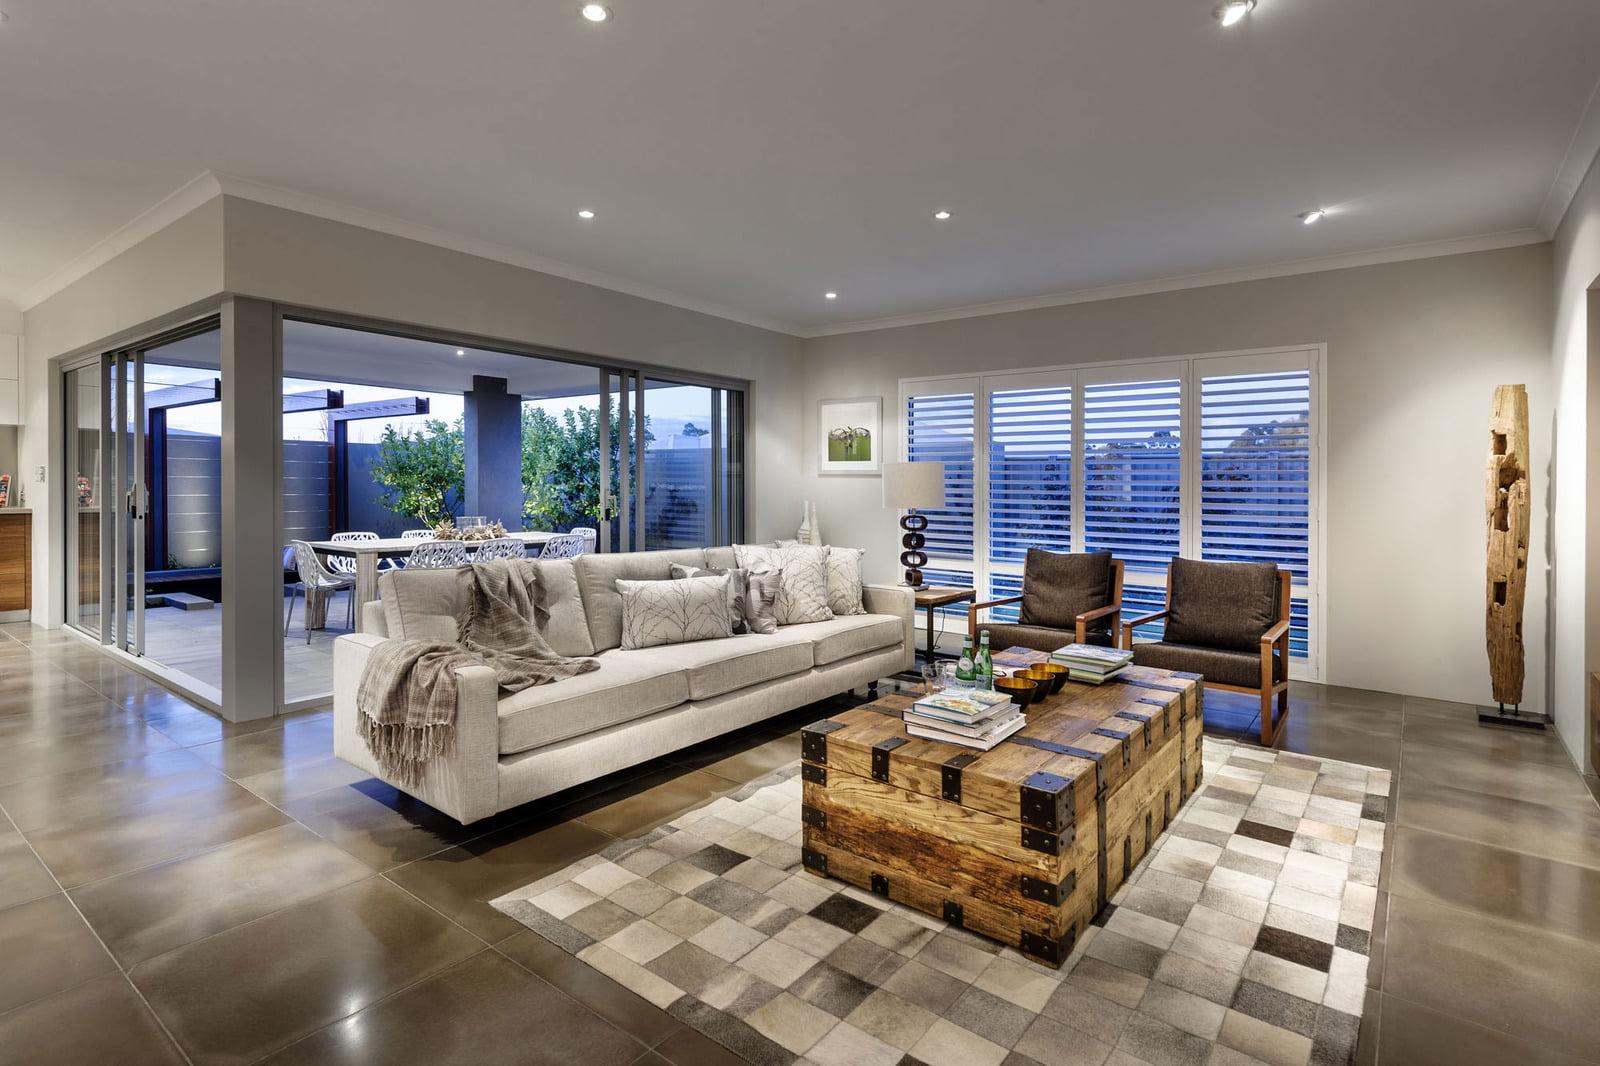 Casa Moderna De Dos Pisos Y Hermoso Diseno Constructora Paramount - Casa-de-diseo-de-interiores